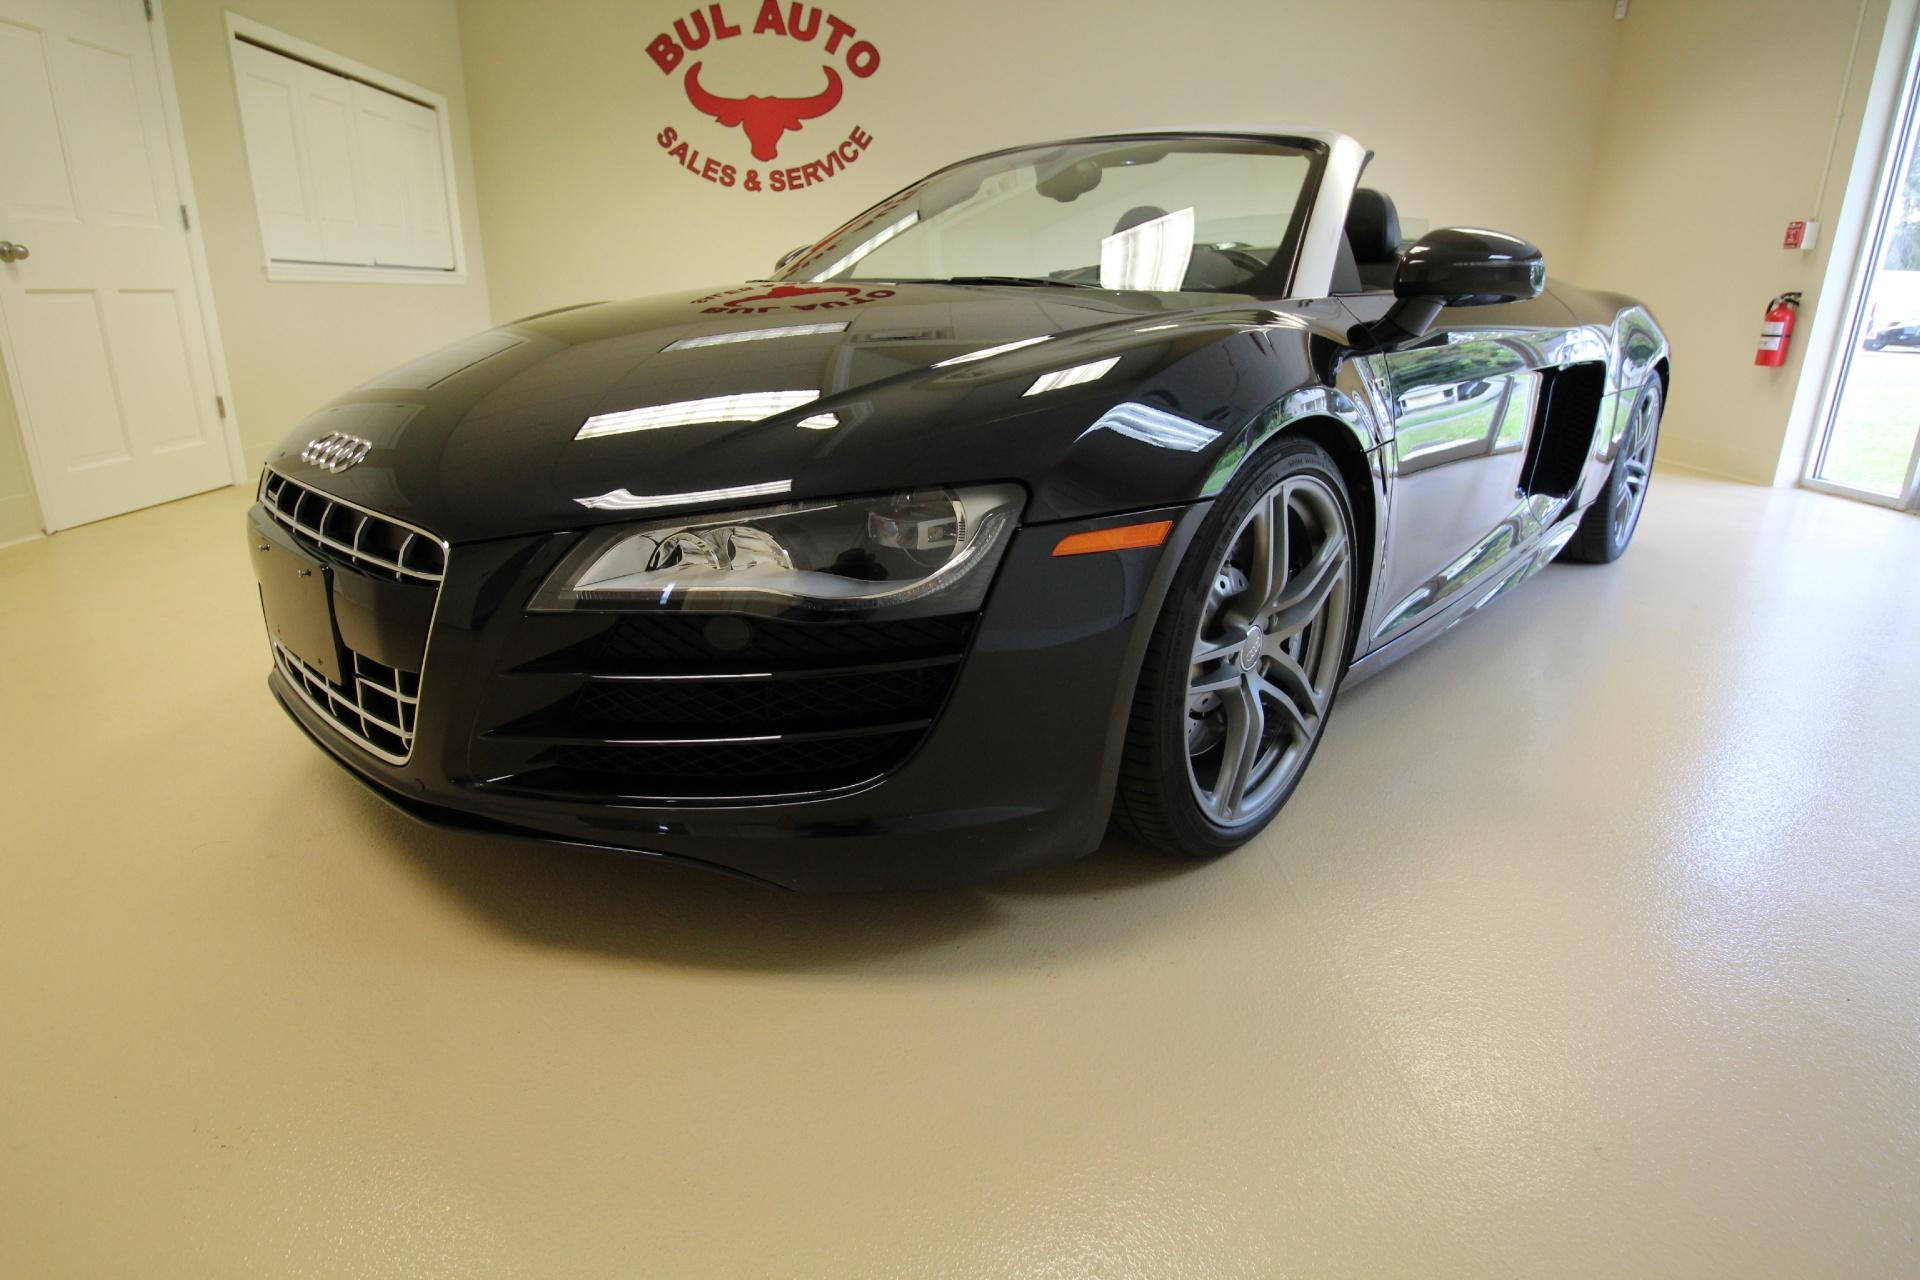 2011 audi r8 5 2 quattro spyder rare 6 speed manual like new stock rh bulautosales com Lamborghini Gallardo vs Audi R8 audi r8 auto or manual